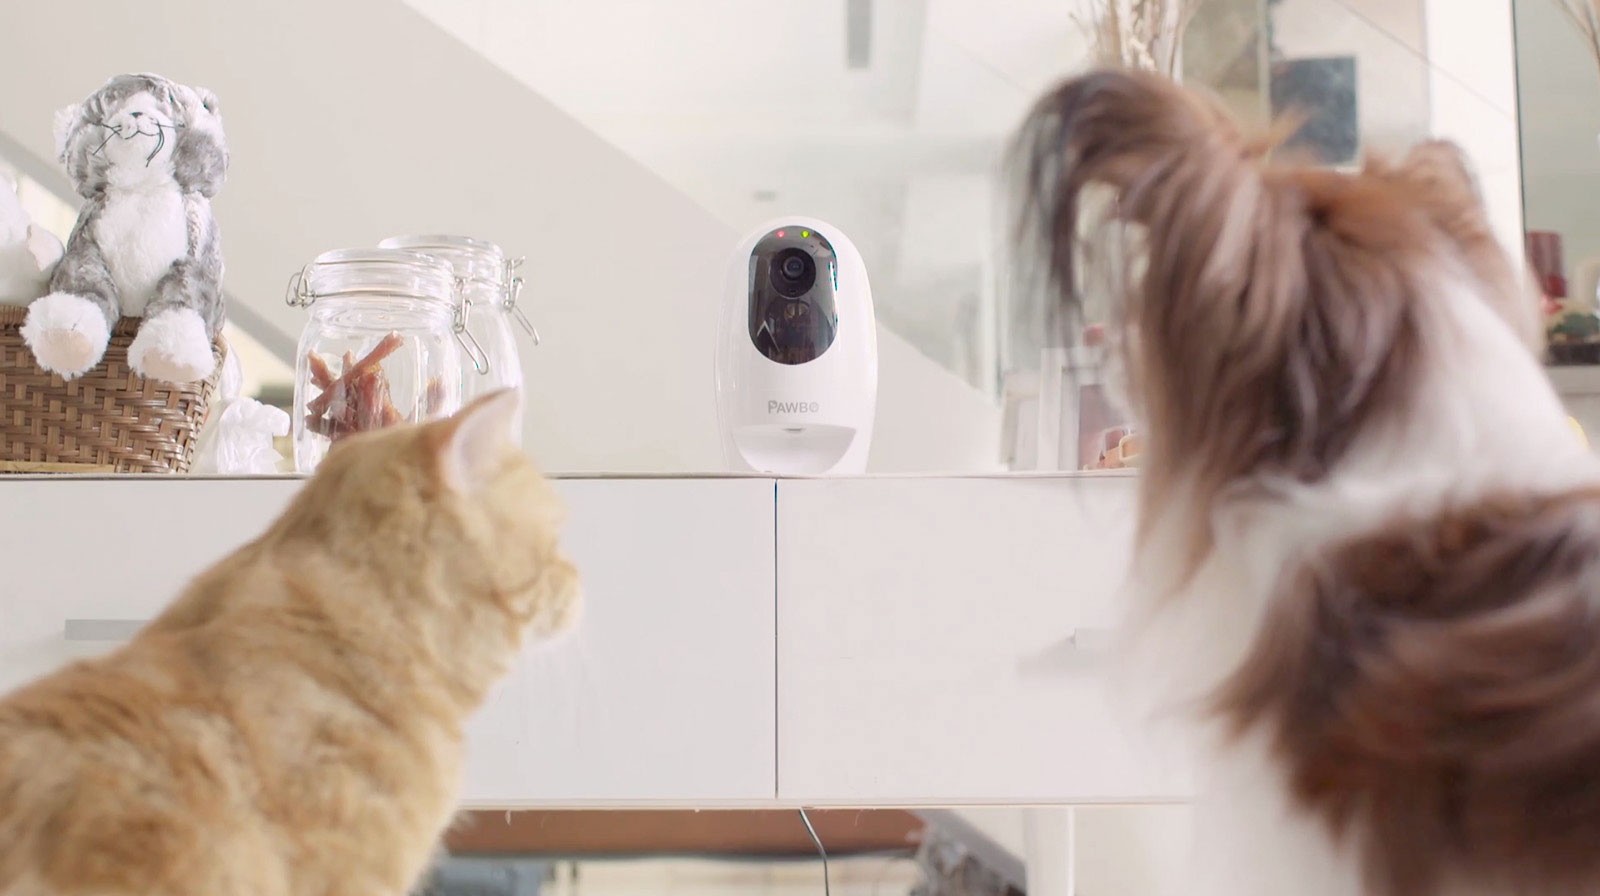 Photo of Acum te poți juca cu câinele prin Wi-Fi, cu Pawbo+